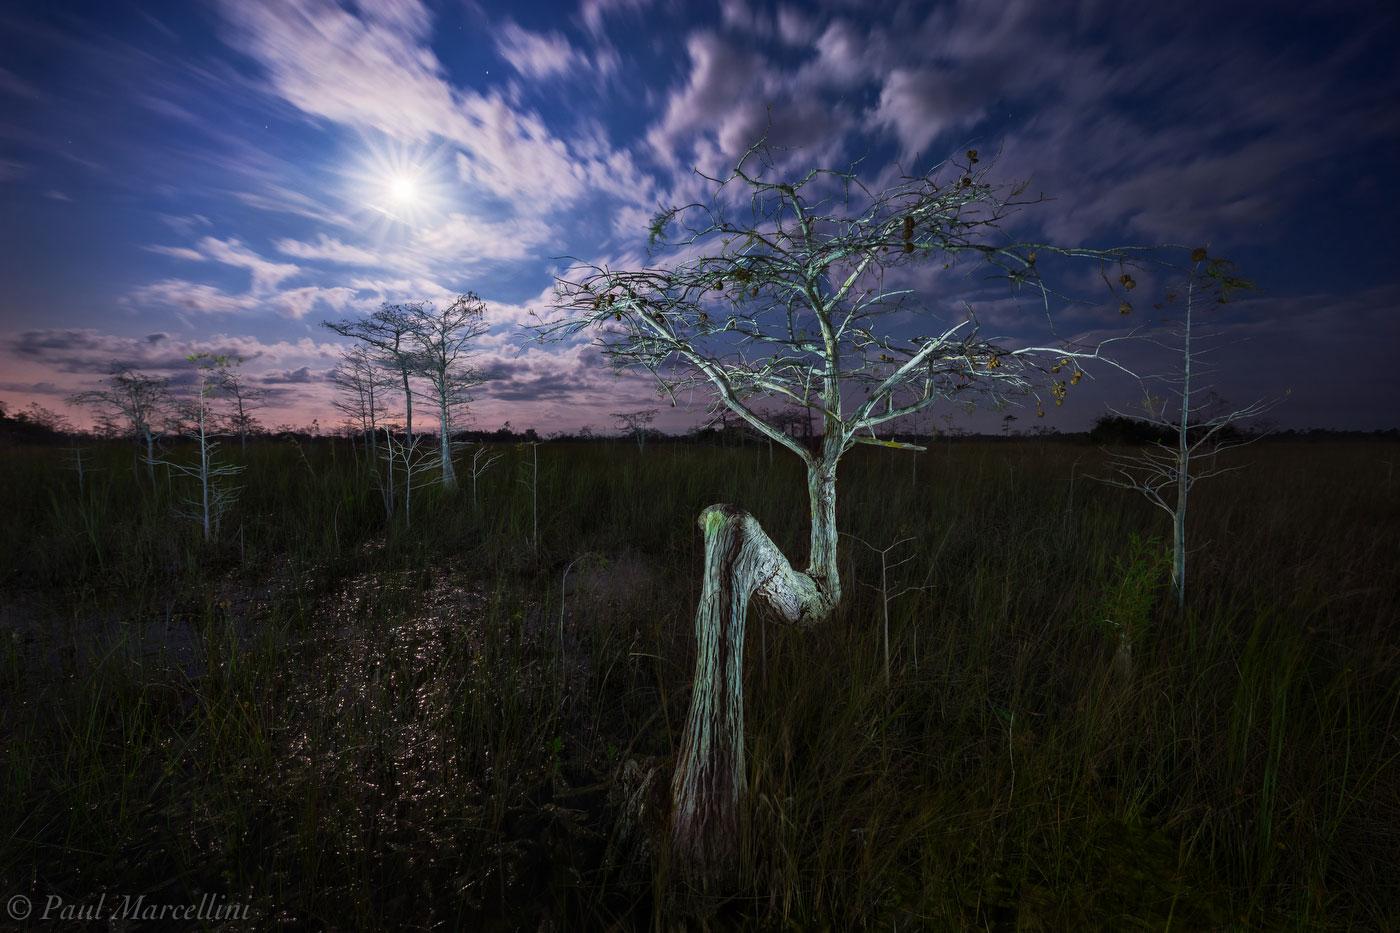 Everglades National Park, Florida, cypress, full moon, night, nature, photography, florida national parks, photo